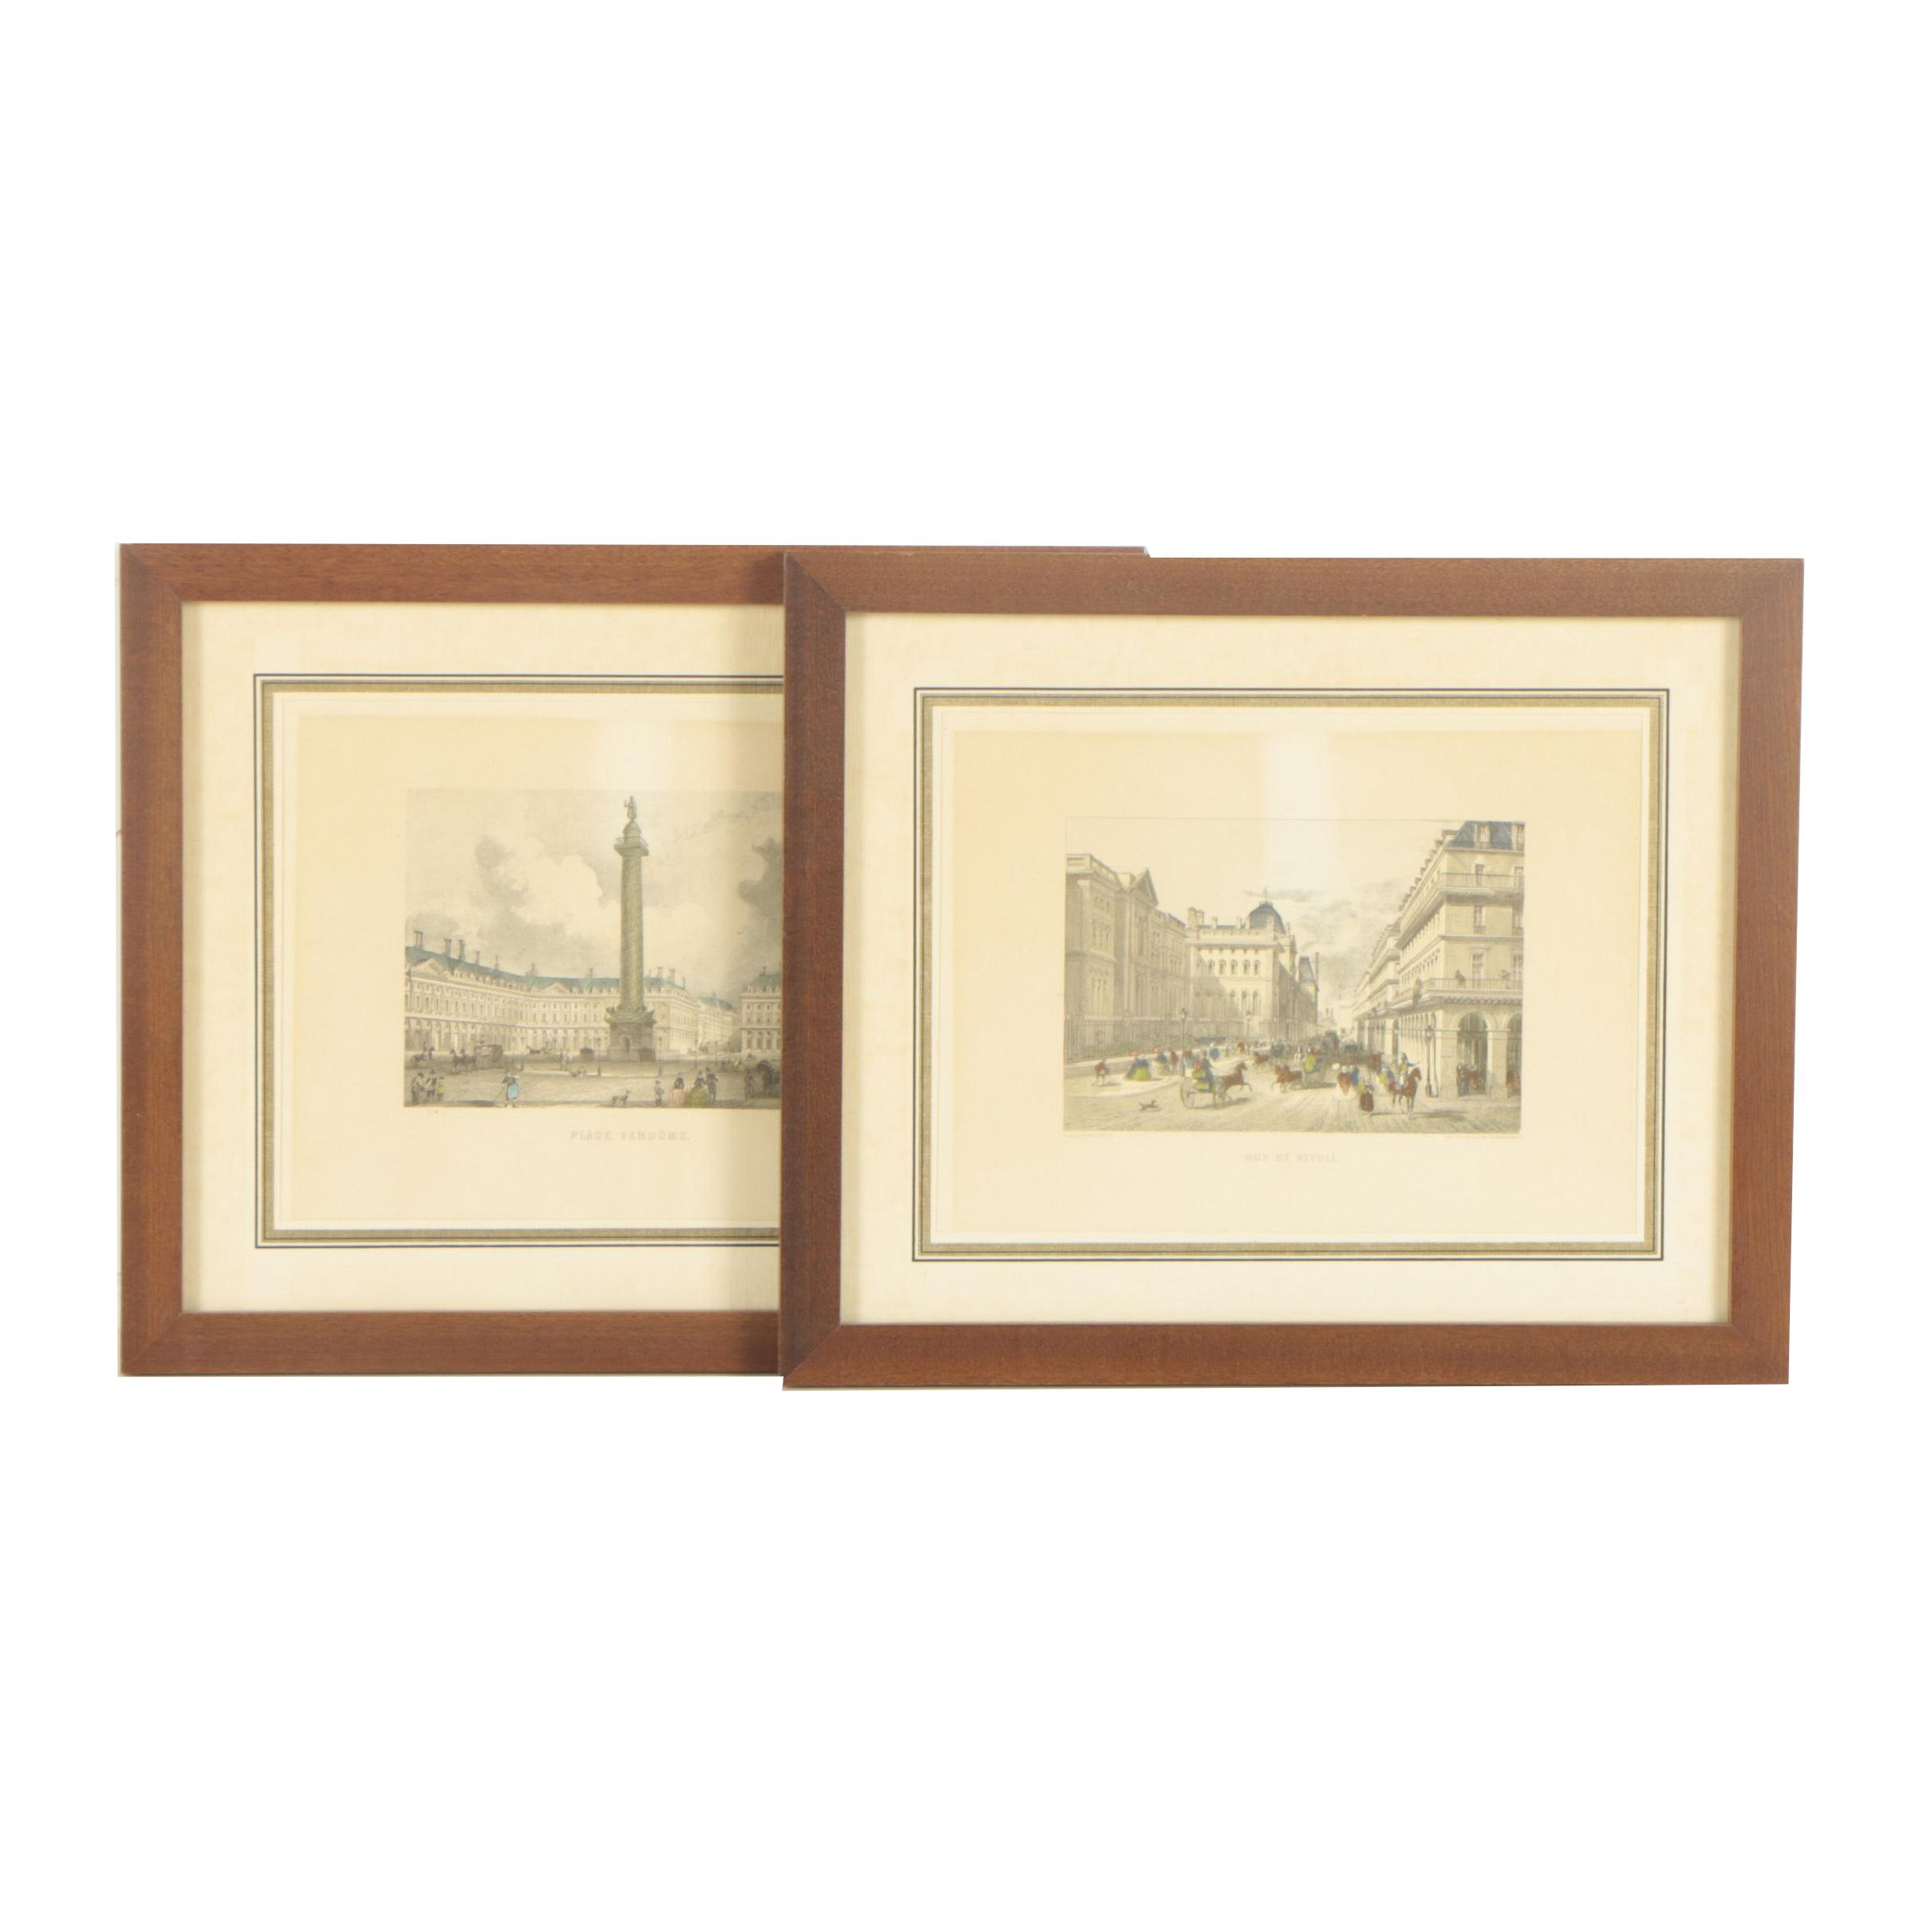 "Hand-Colored Lithographs ""Place Vendôme"" and ""Rue de Rivoli"""